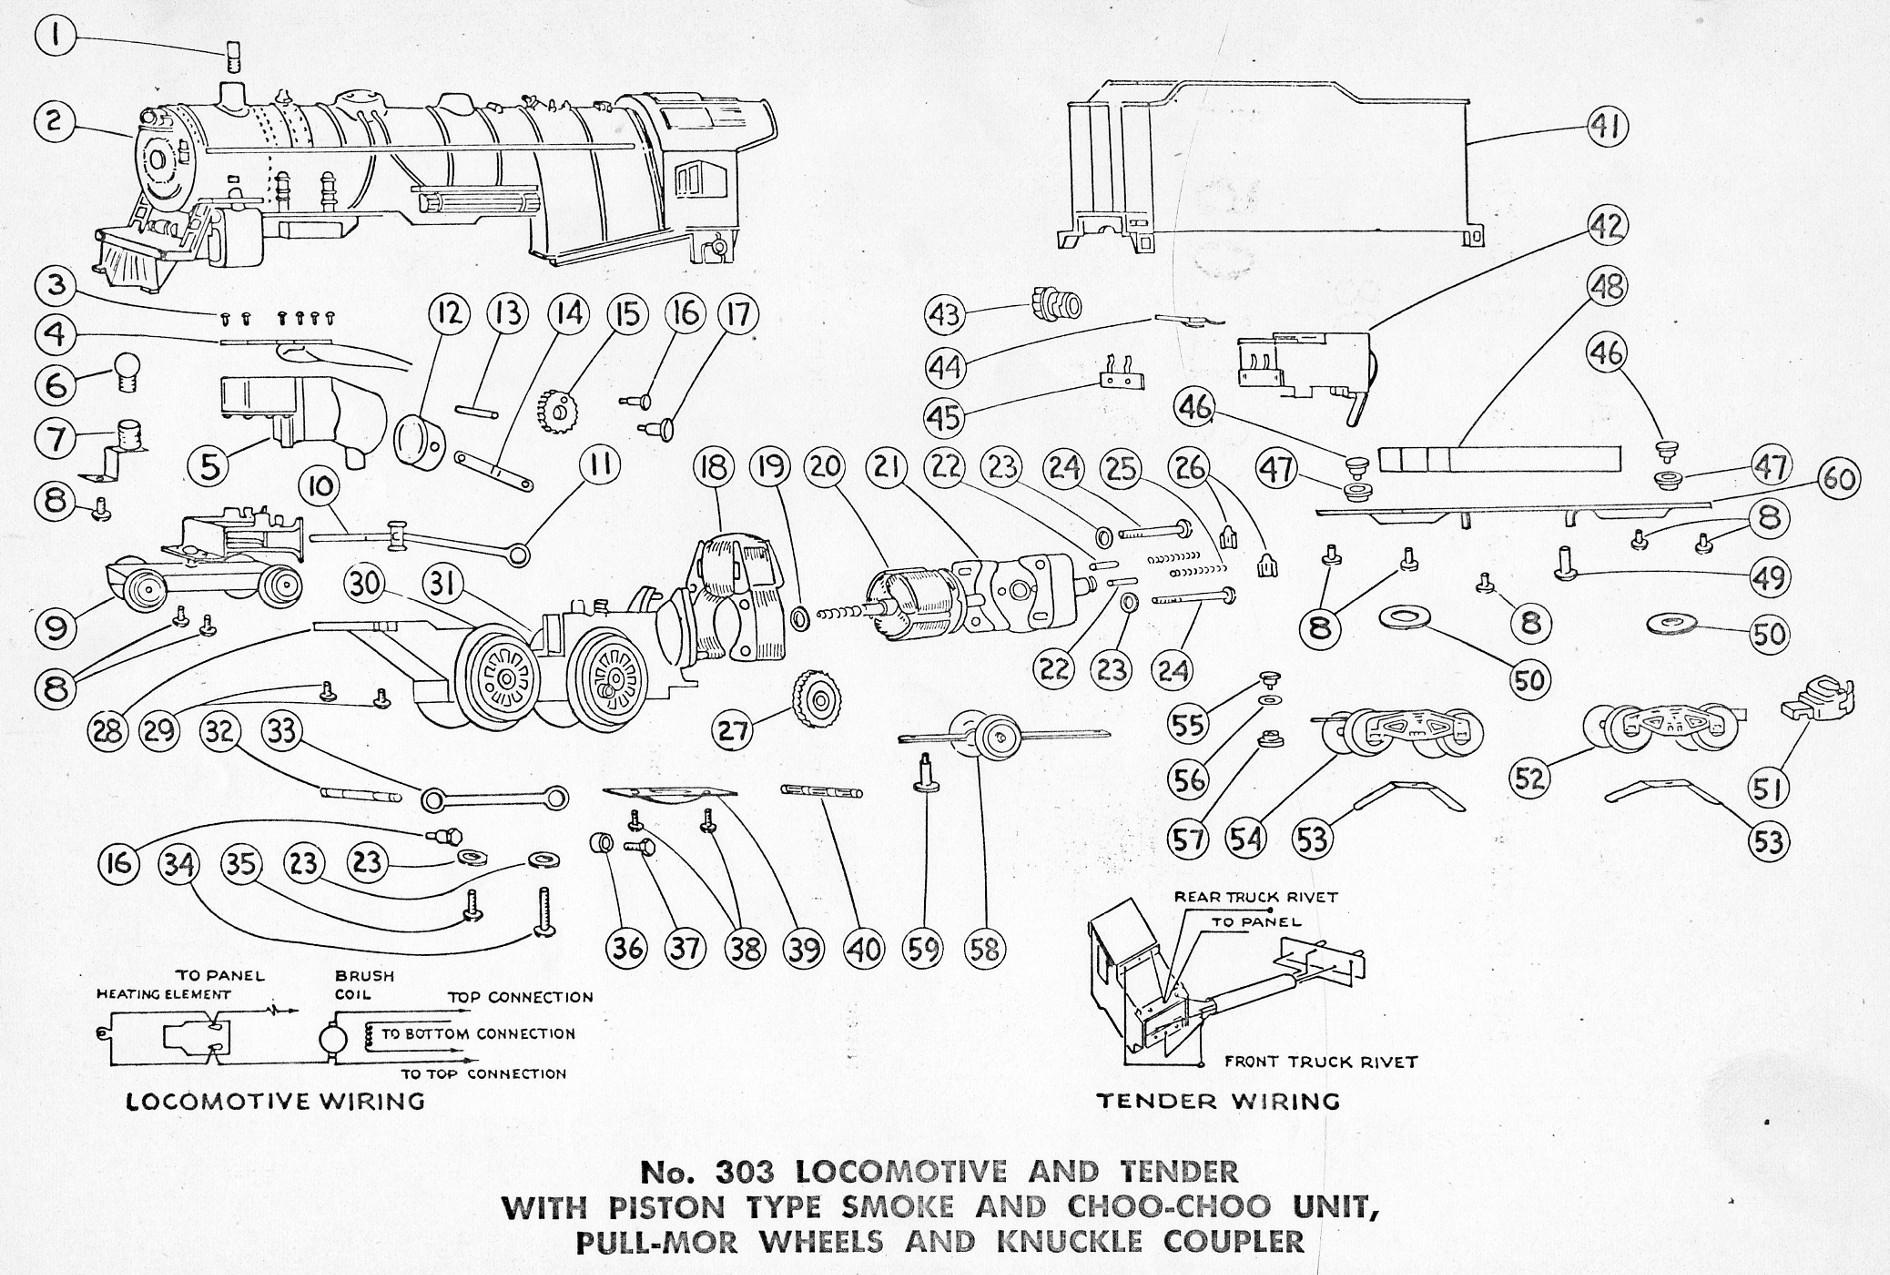 Civic Hatchback Eg Turbo On 1992 Honda Civic Fuel Injector Diagram